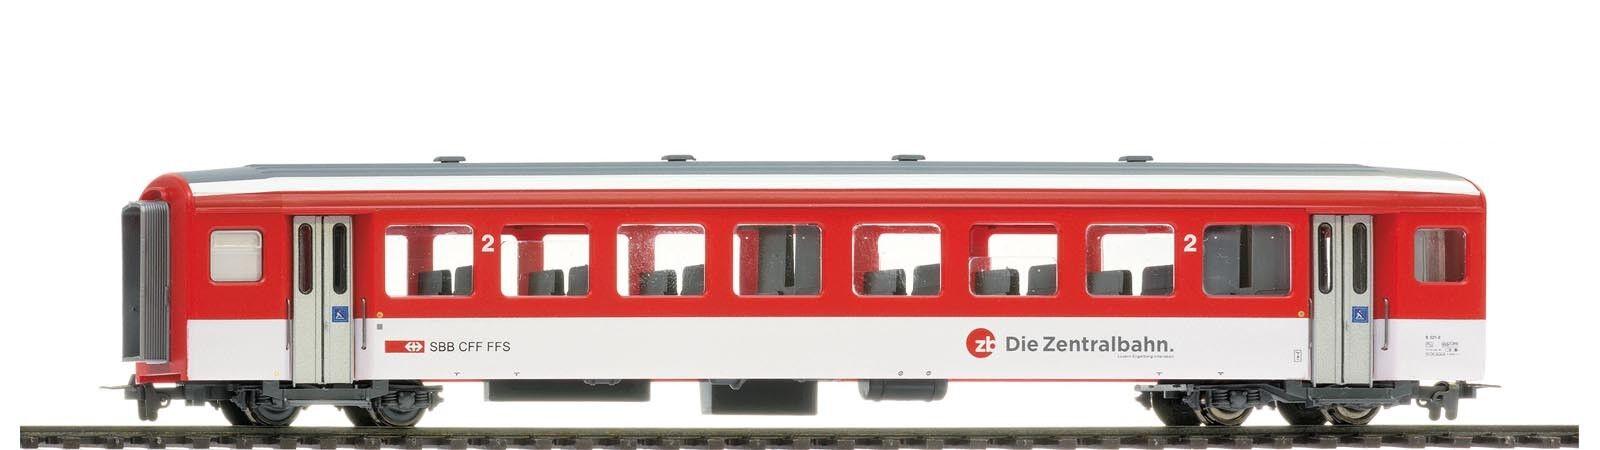 Bemo 3271471-h0m-Narrow Gauge-Passenger voiture EWIII 2.kl. b521-8 SBB Brünig  ZB  rentable